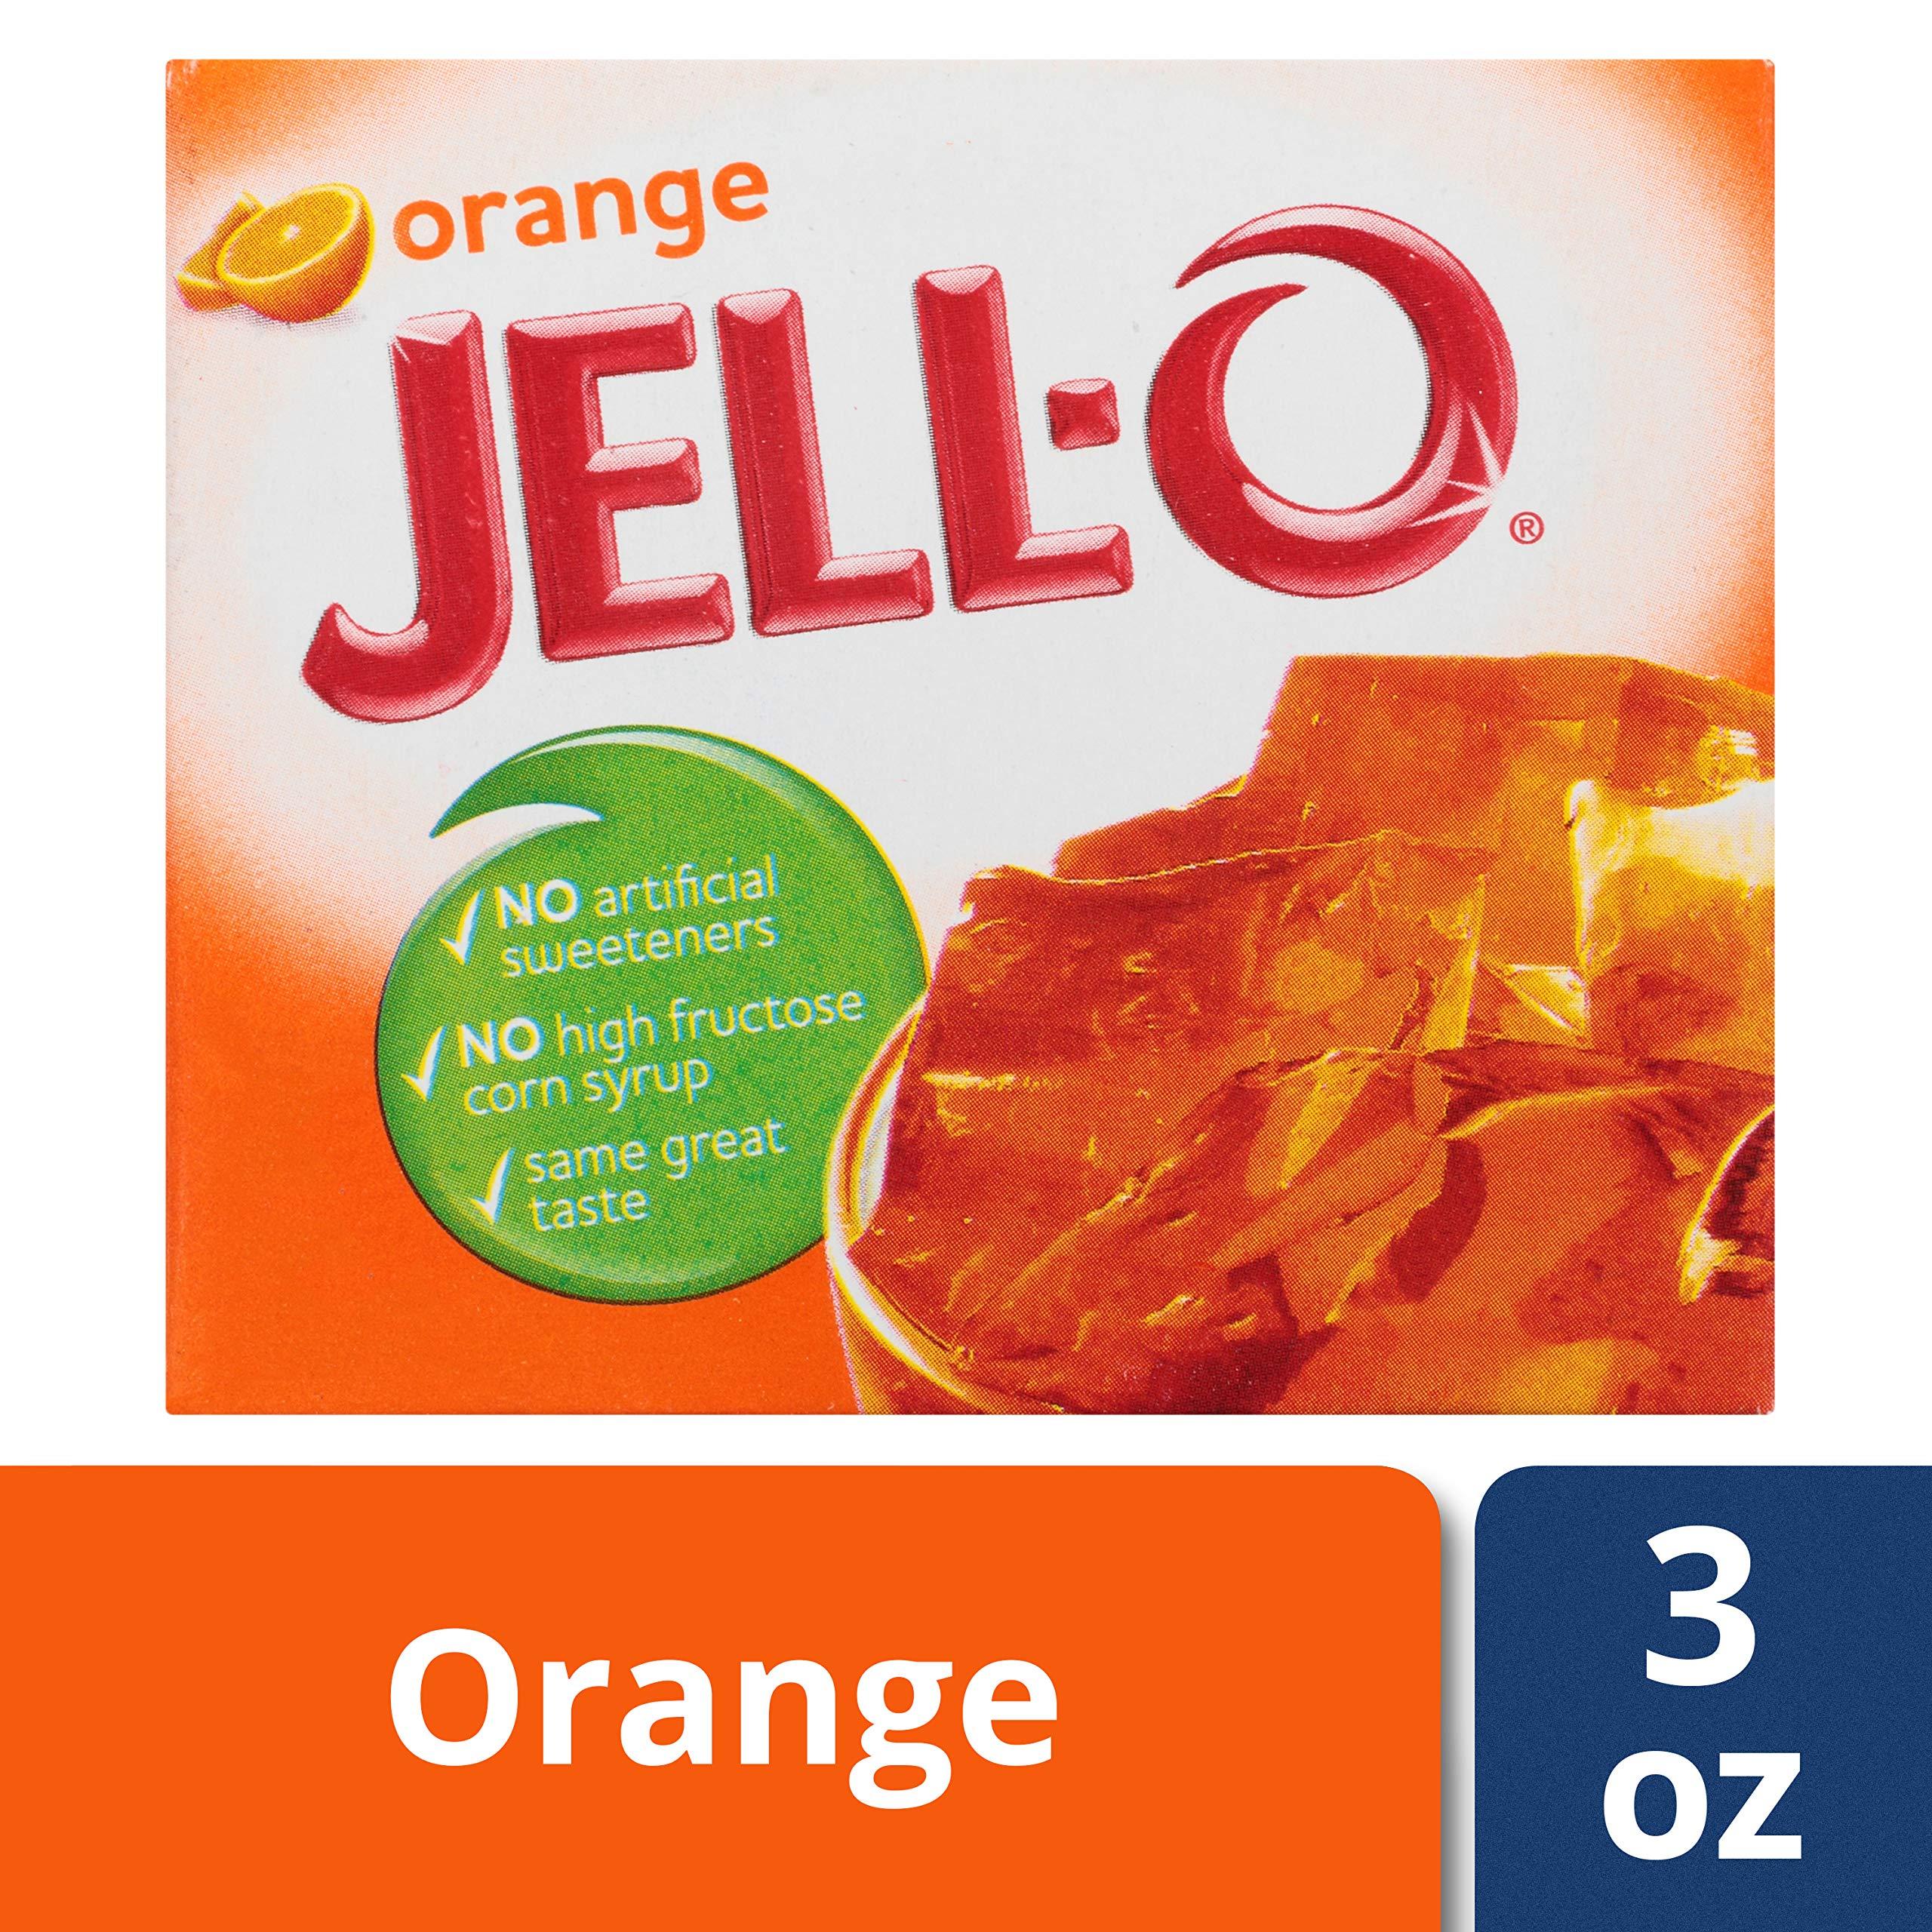 Jell-O Orange Gelatin Dessert Mix, 3 oz Box